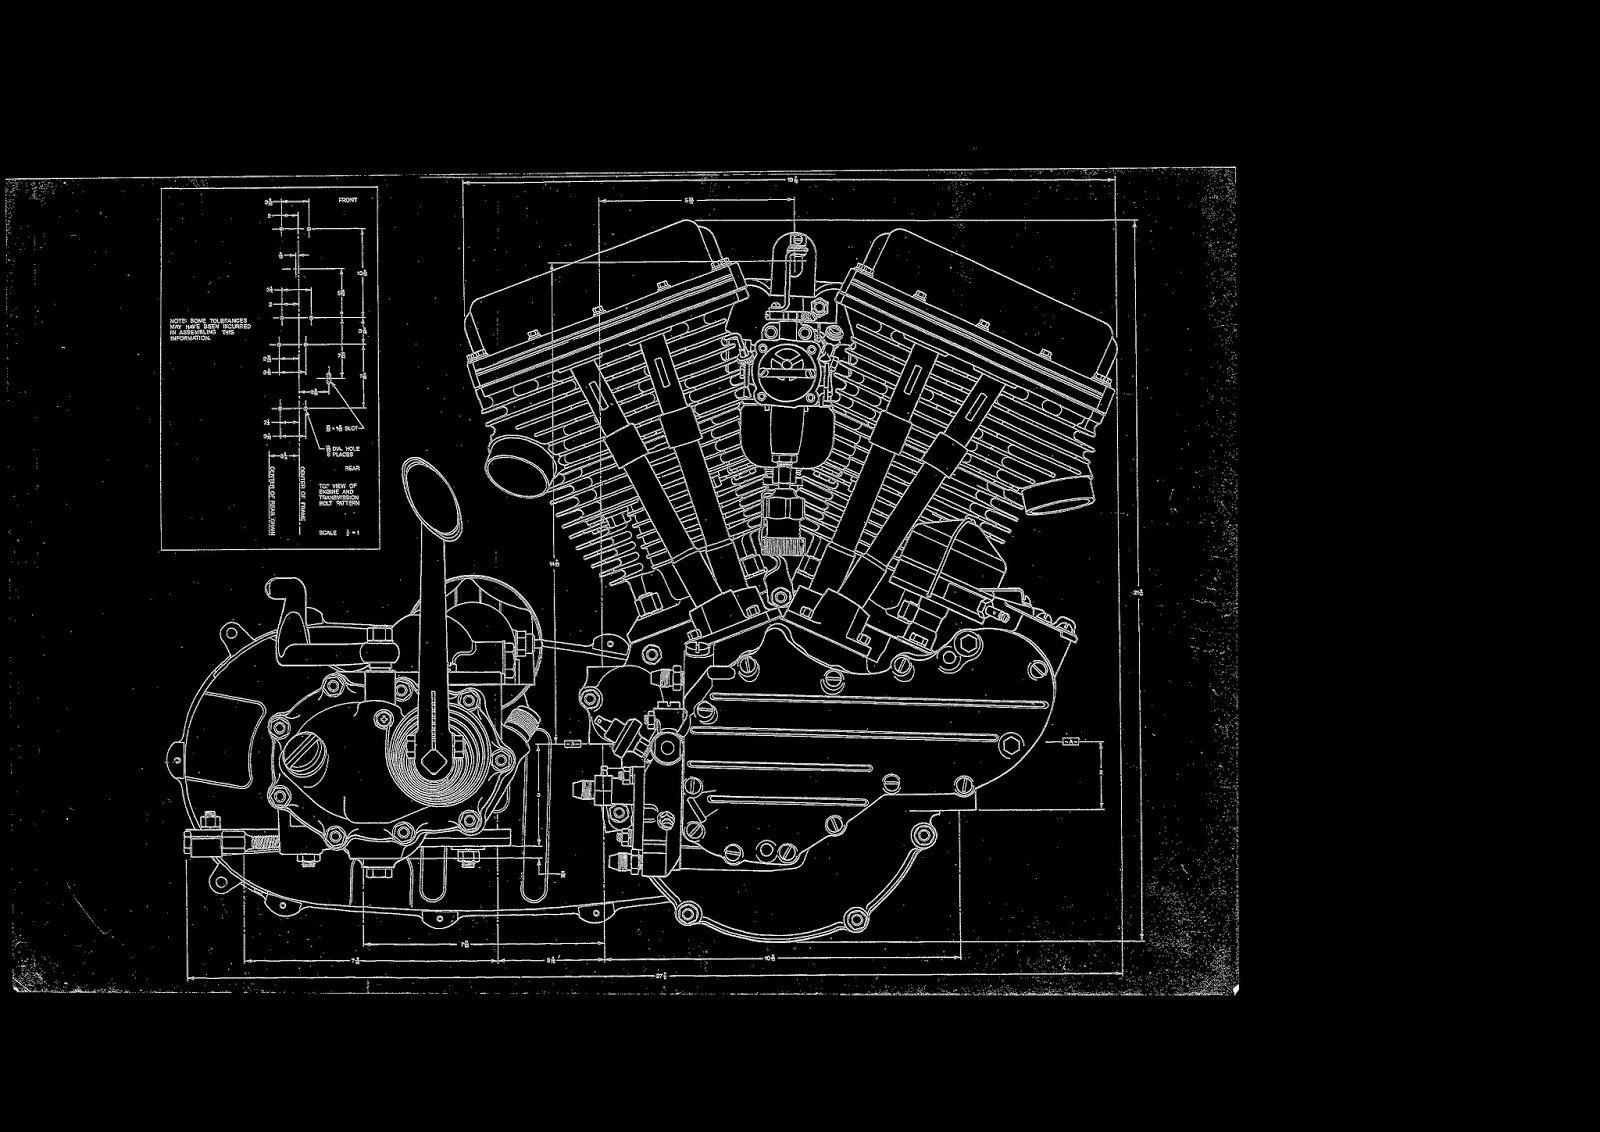 Harley davidson fl panhead engine blueprint blueprint harley davidson fl panhead engine blueprint malvernweather Images